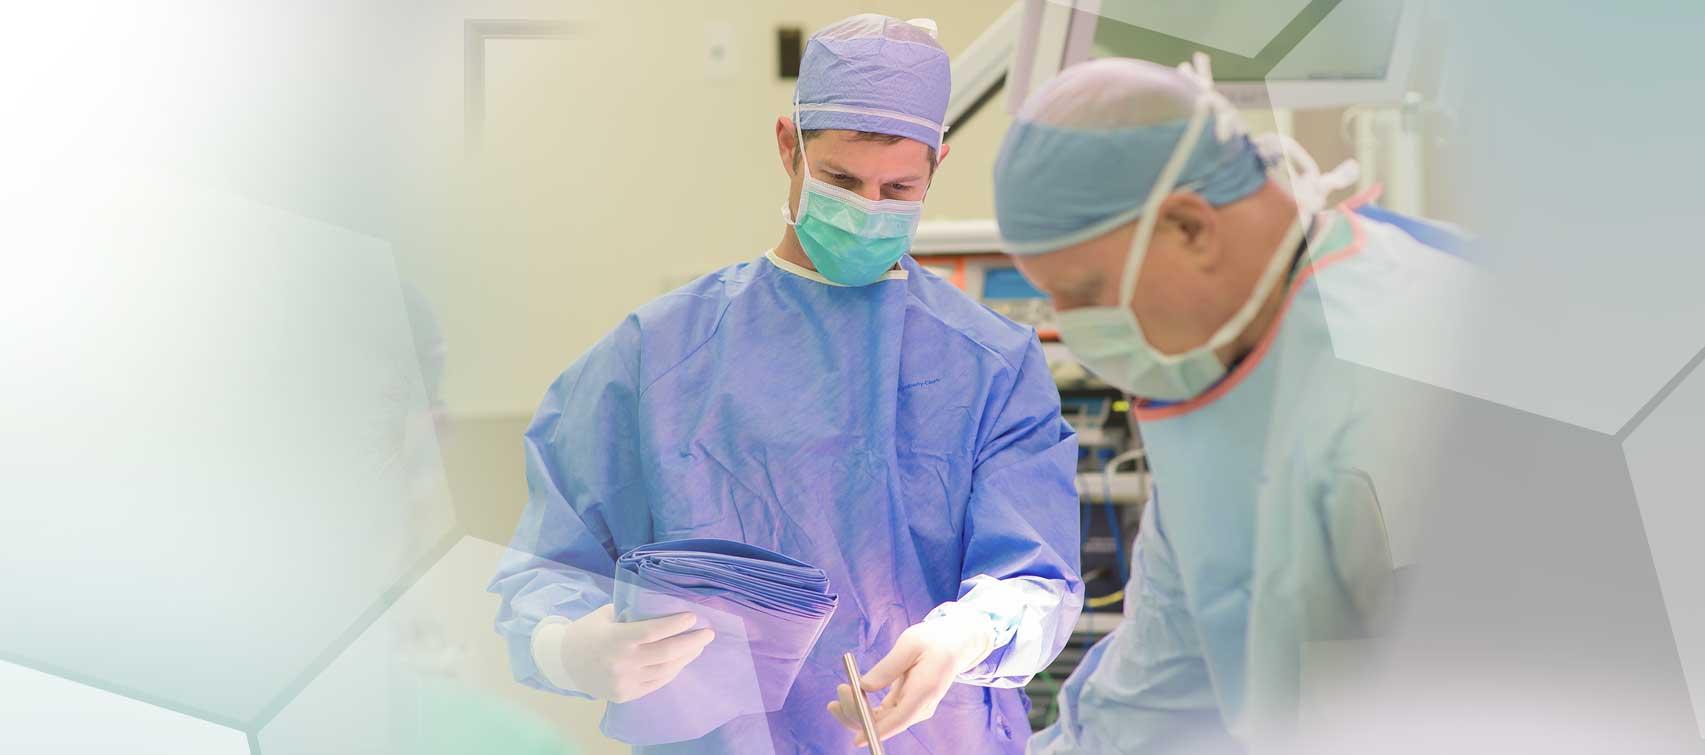 Ian Makey cardiothoracic surgeon UT Medicine